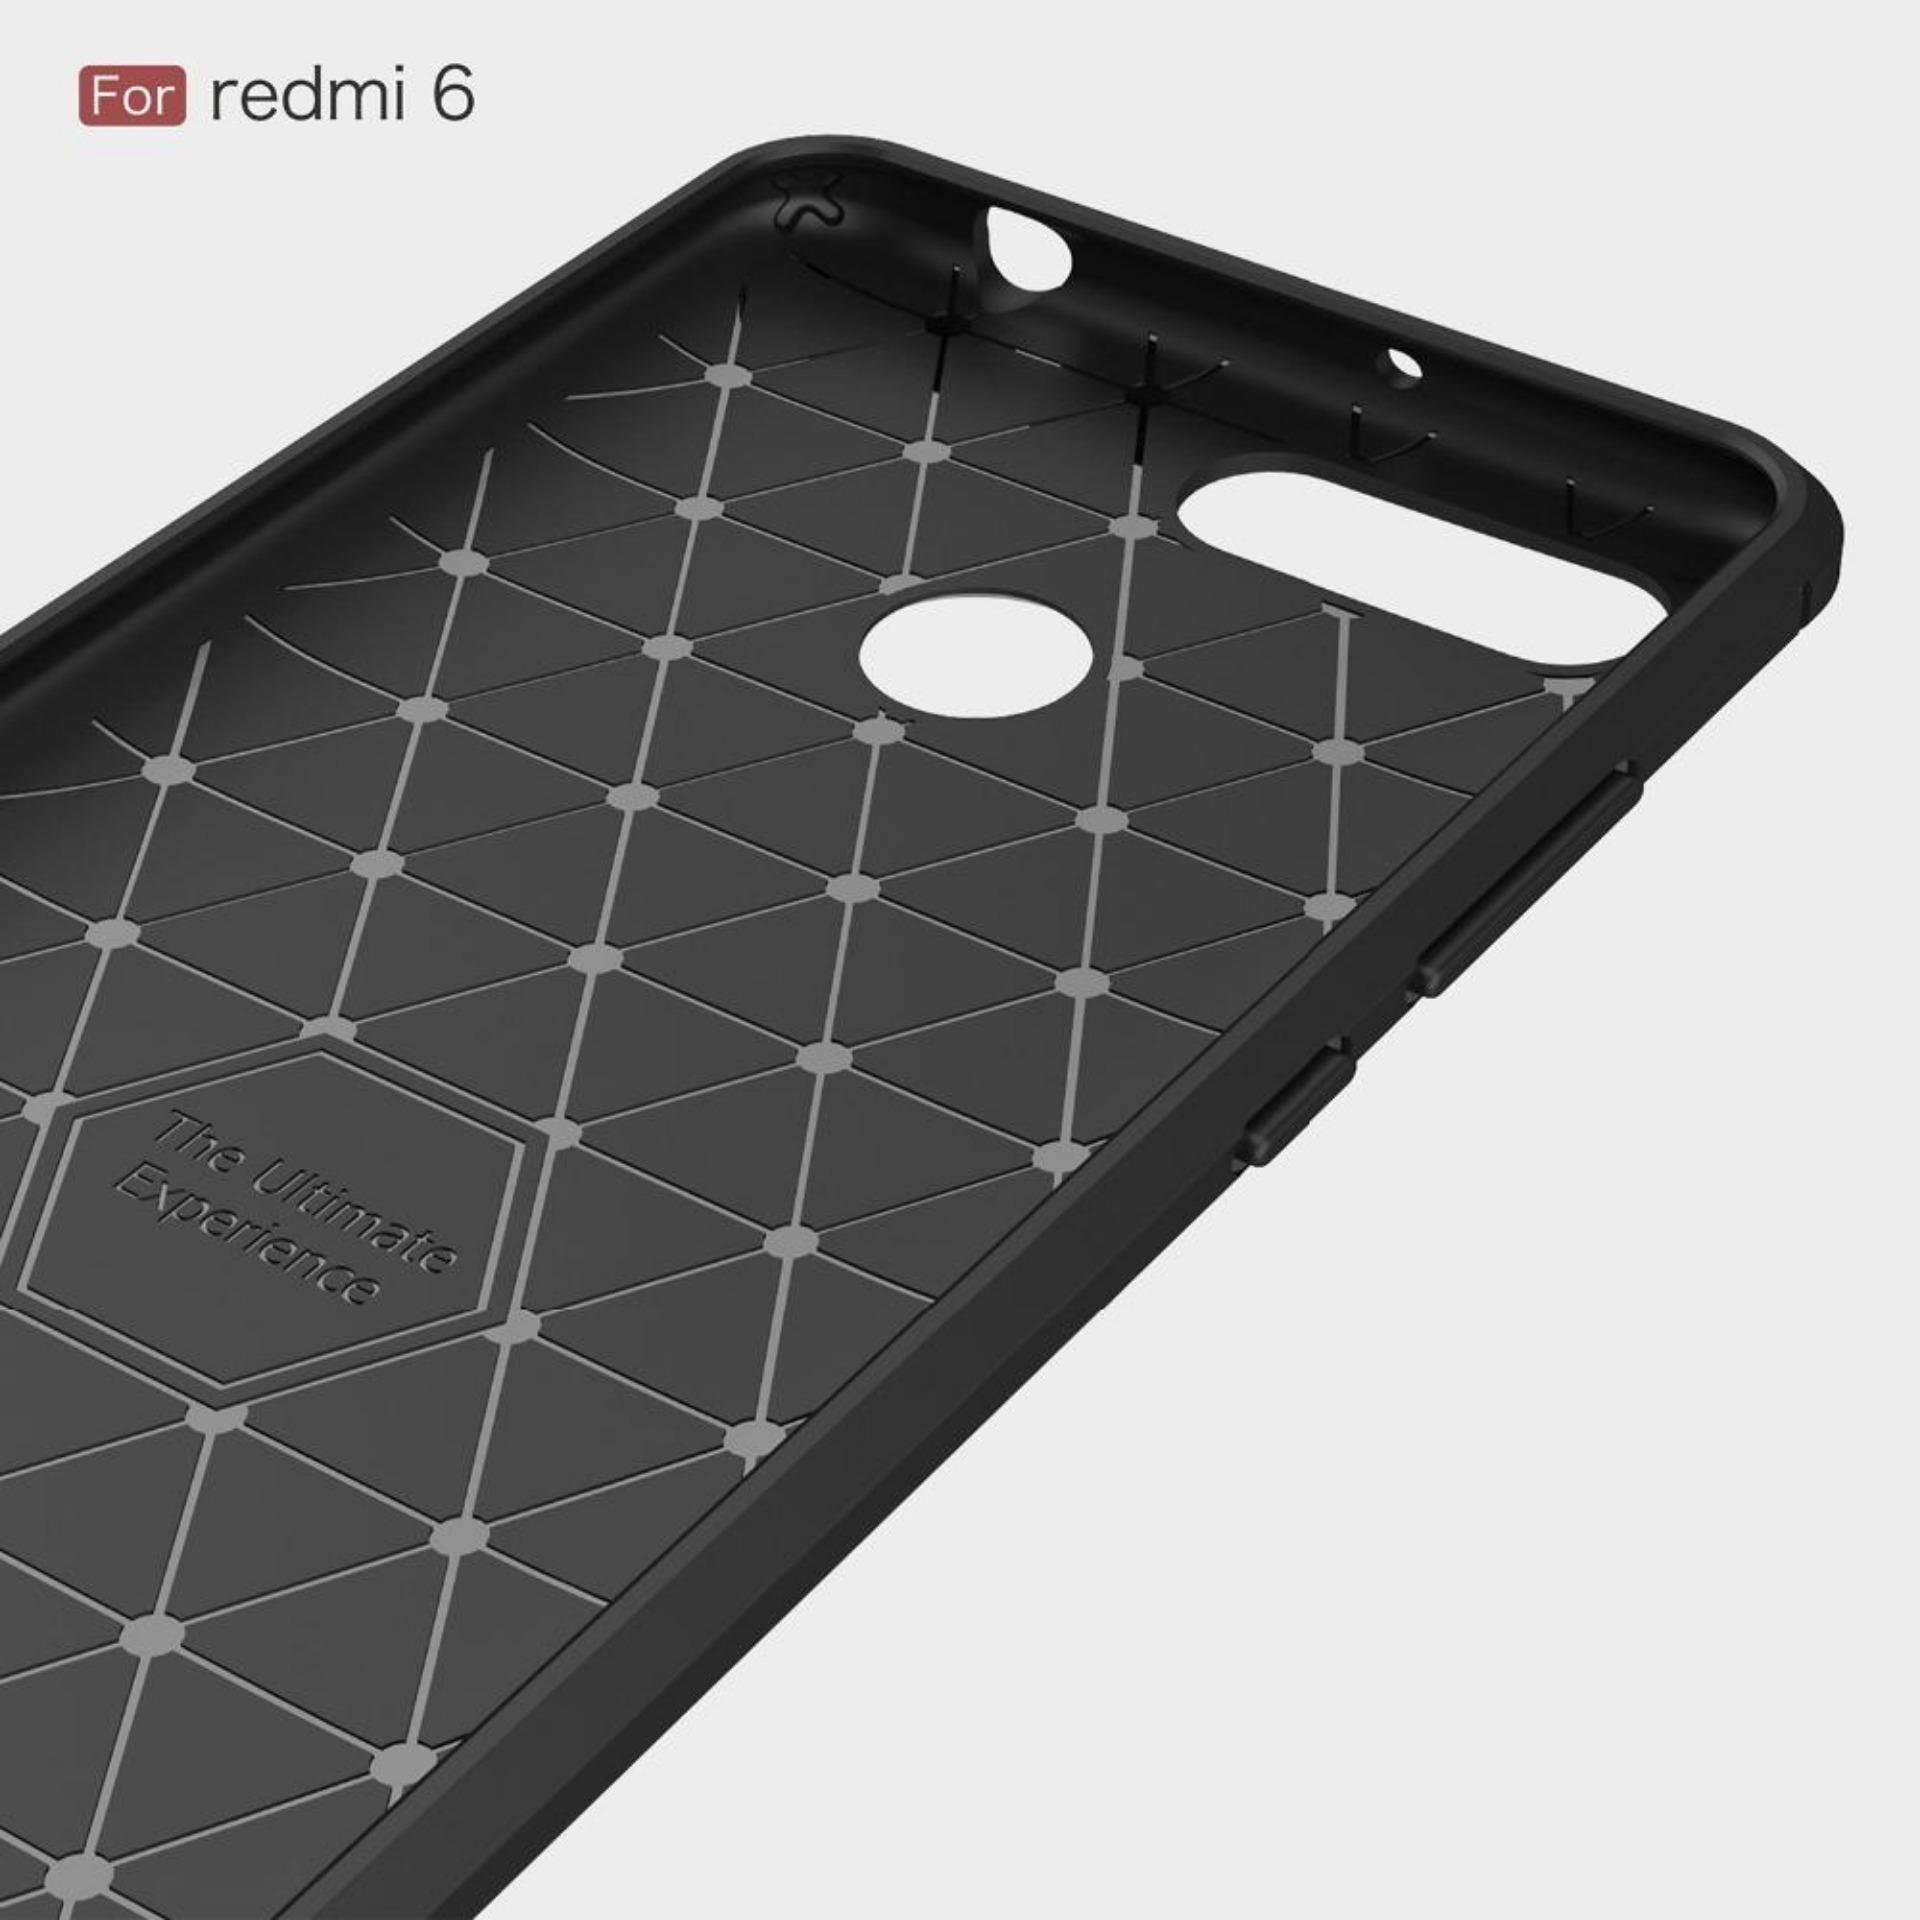 RenzanaAcc Premium Quality Carbon Shockproof Hybrid Case for Xiaomi Redmi 6 - Black .